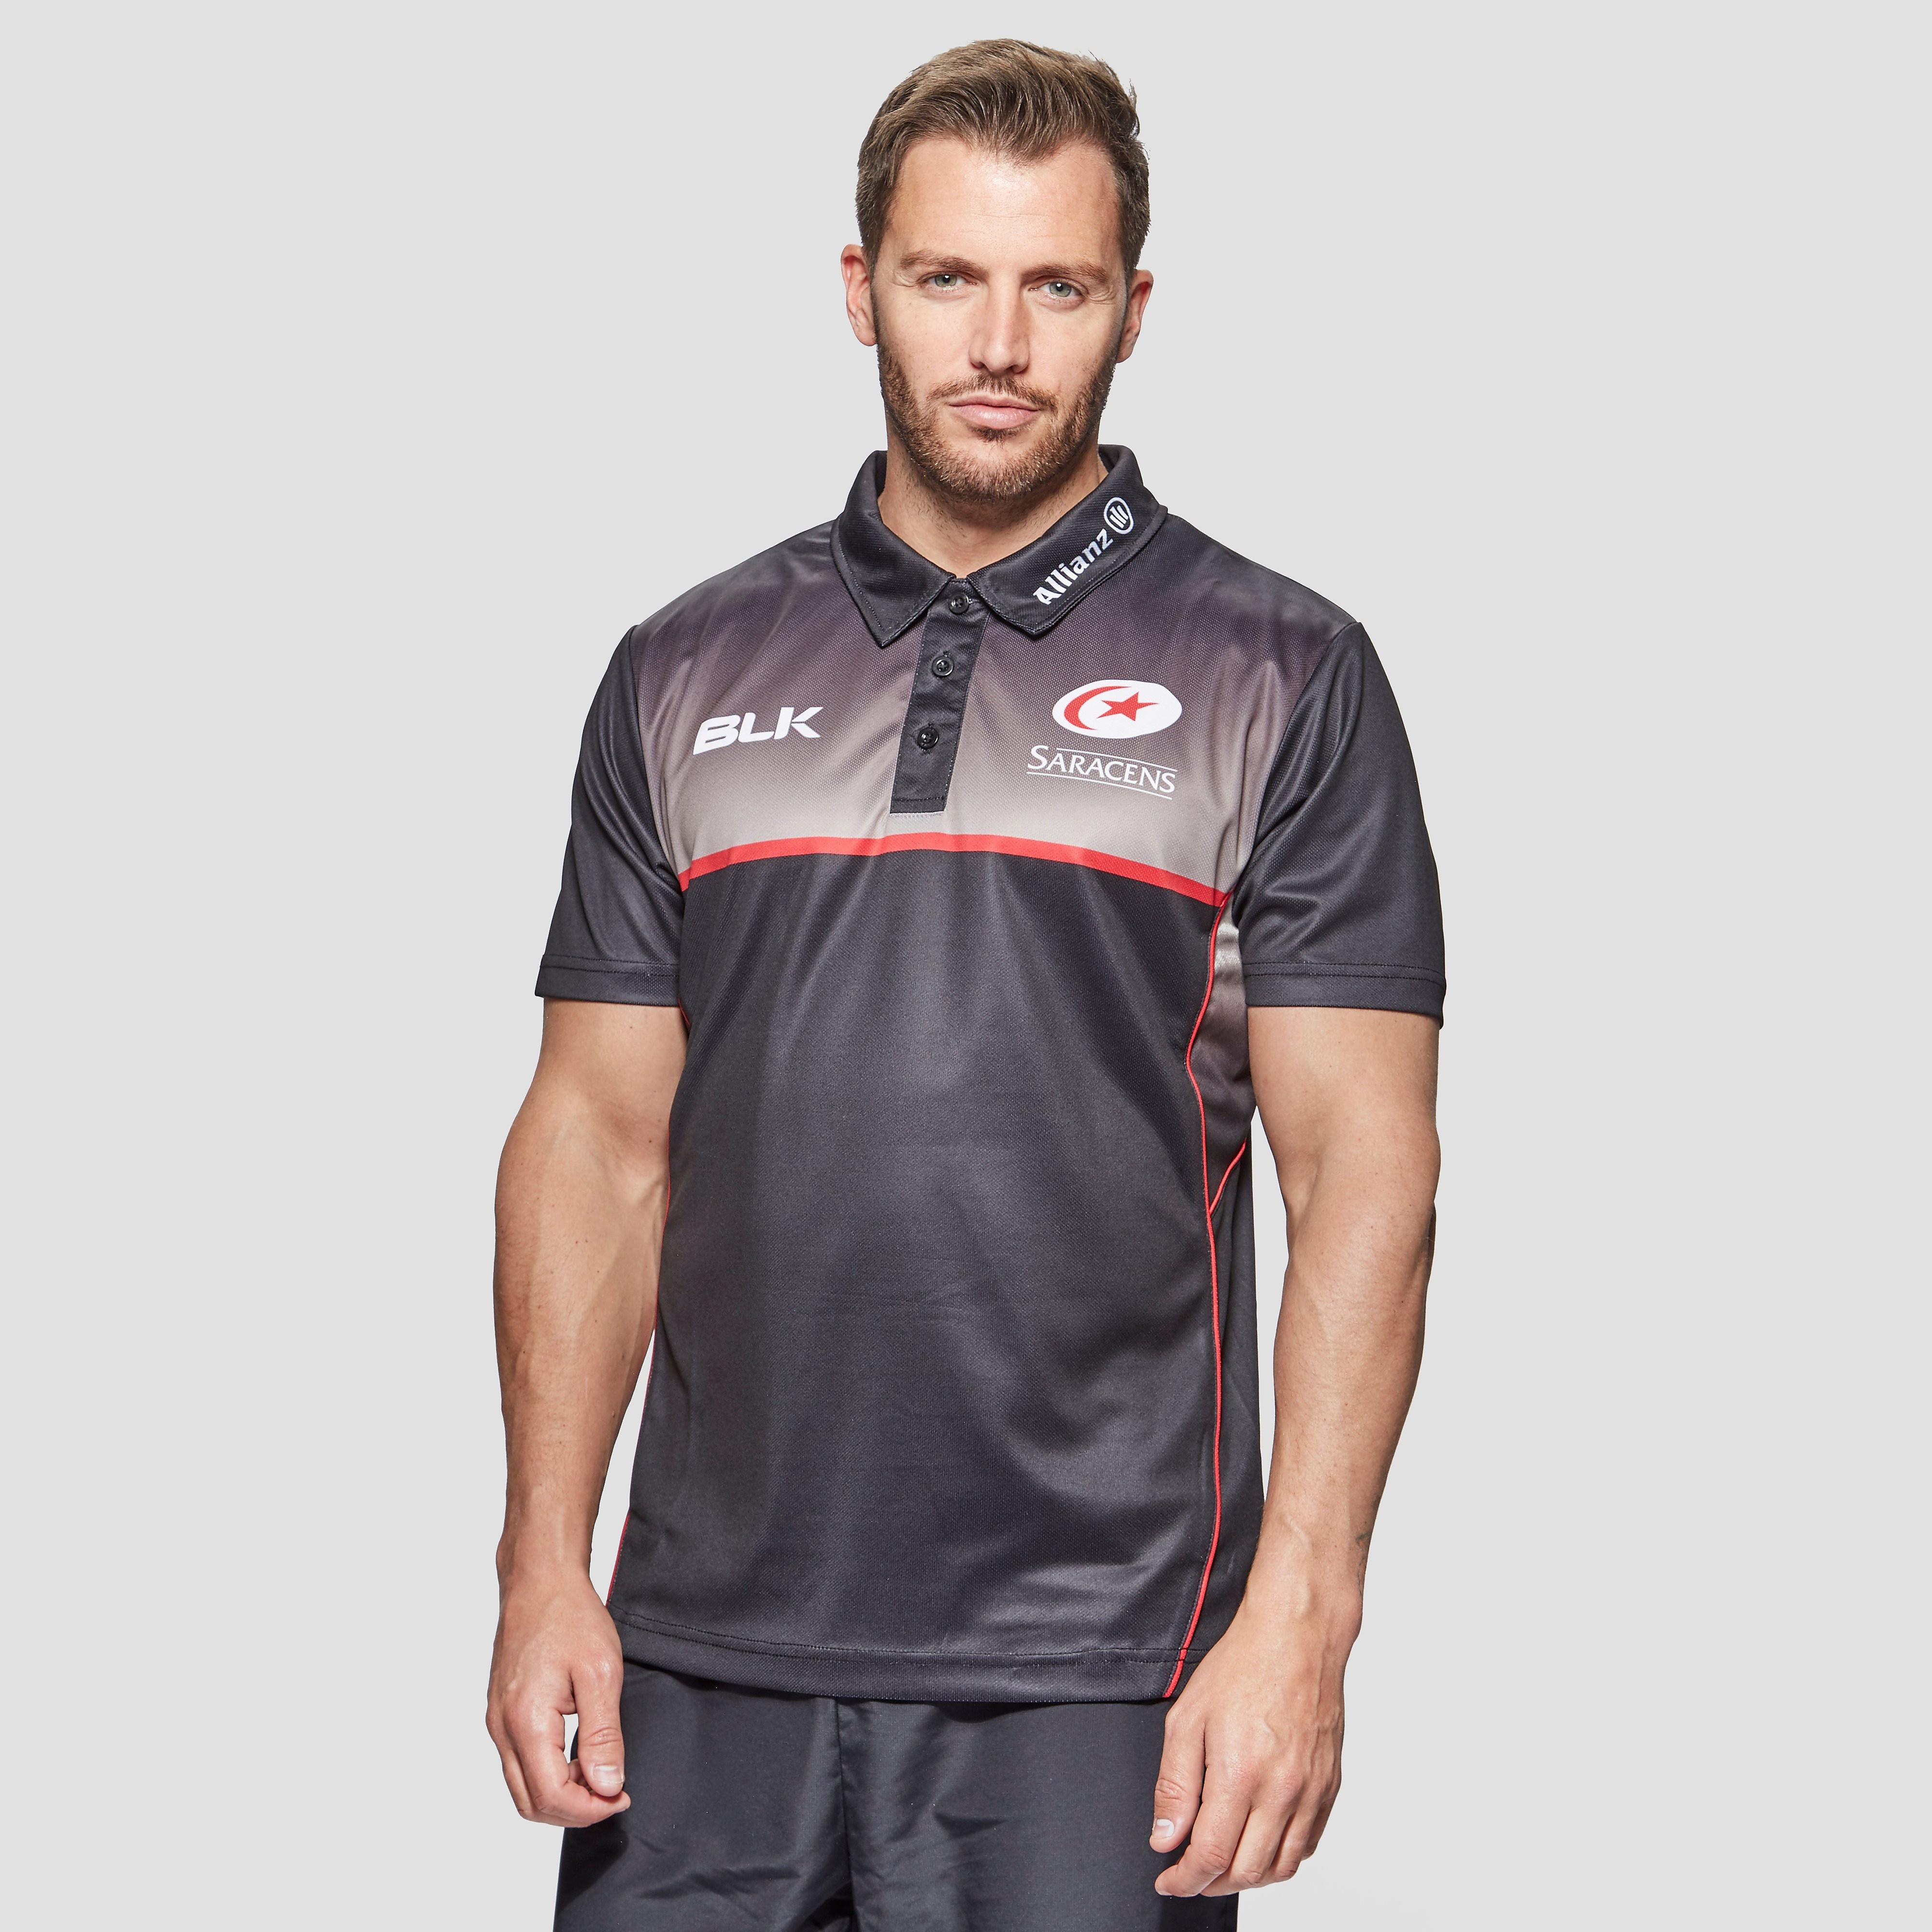 Blk sport Saracens Players Men's Training Polo Shirt